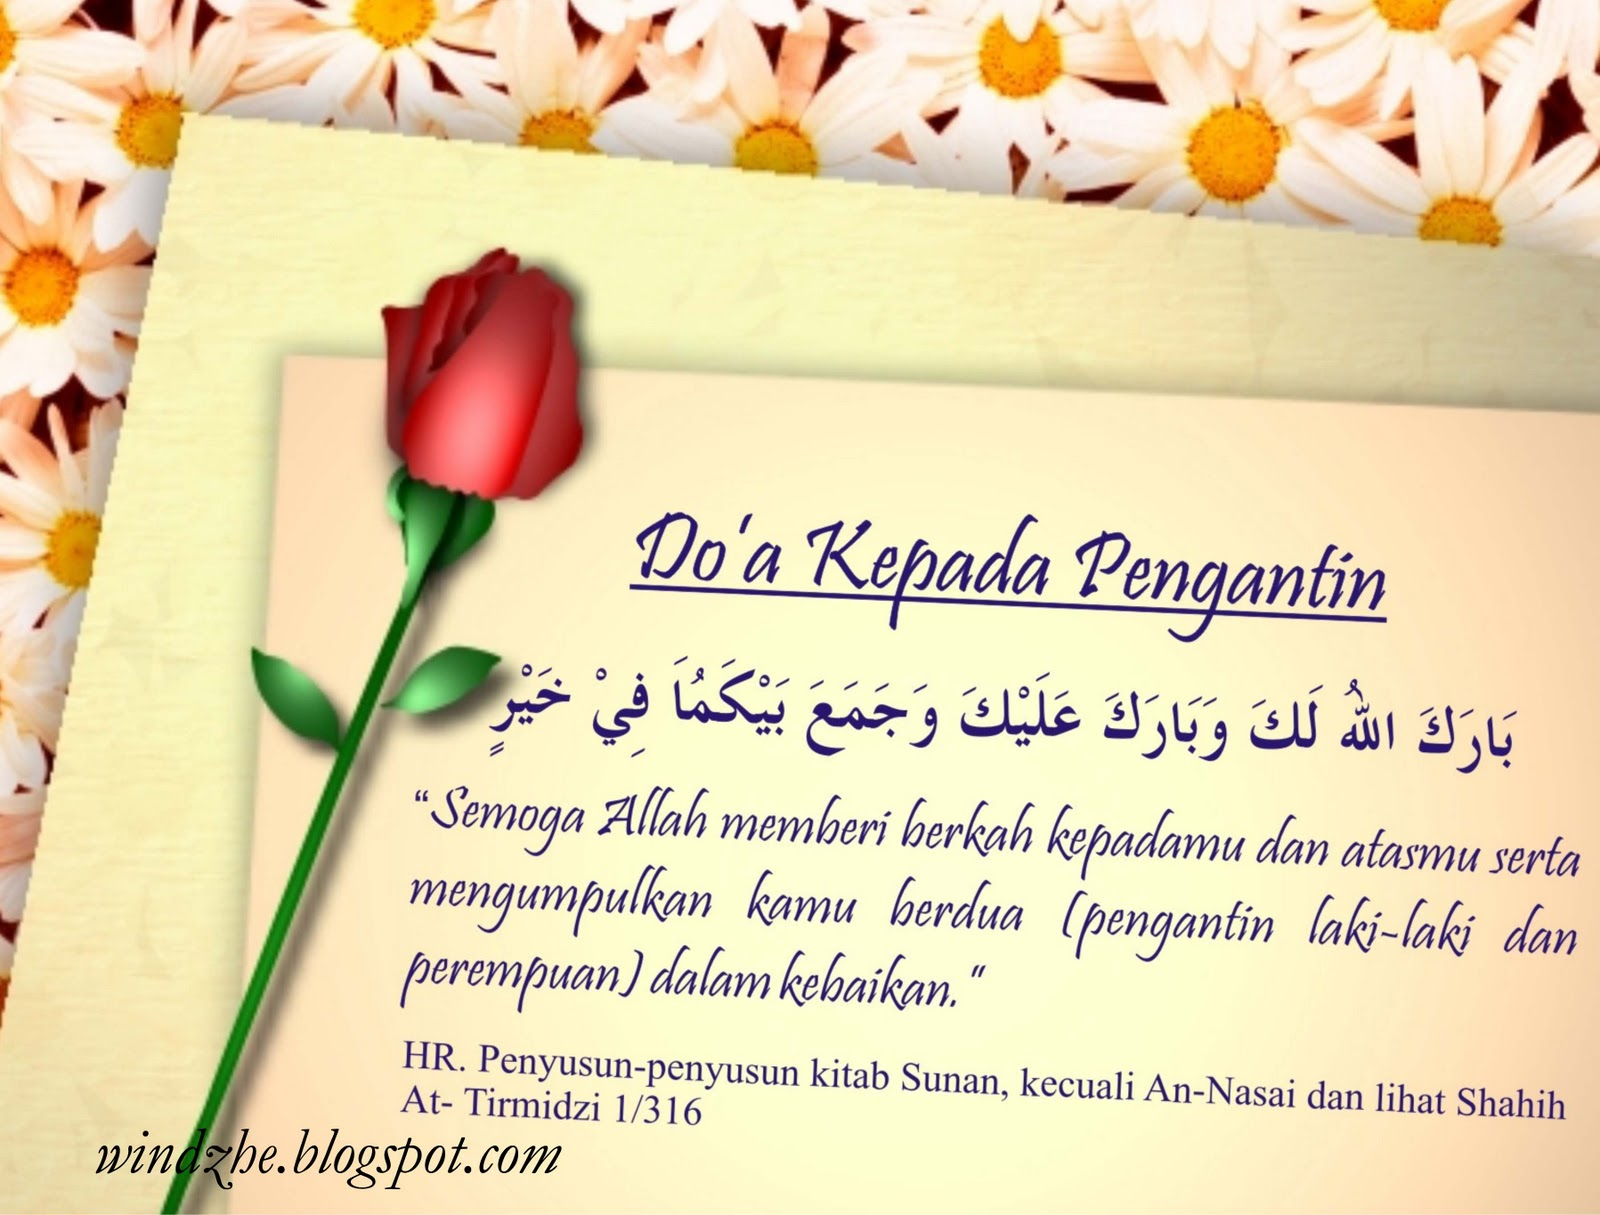 Koleksi Dp Bbm Ulang Tahun Pernikahan Islami